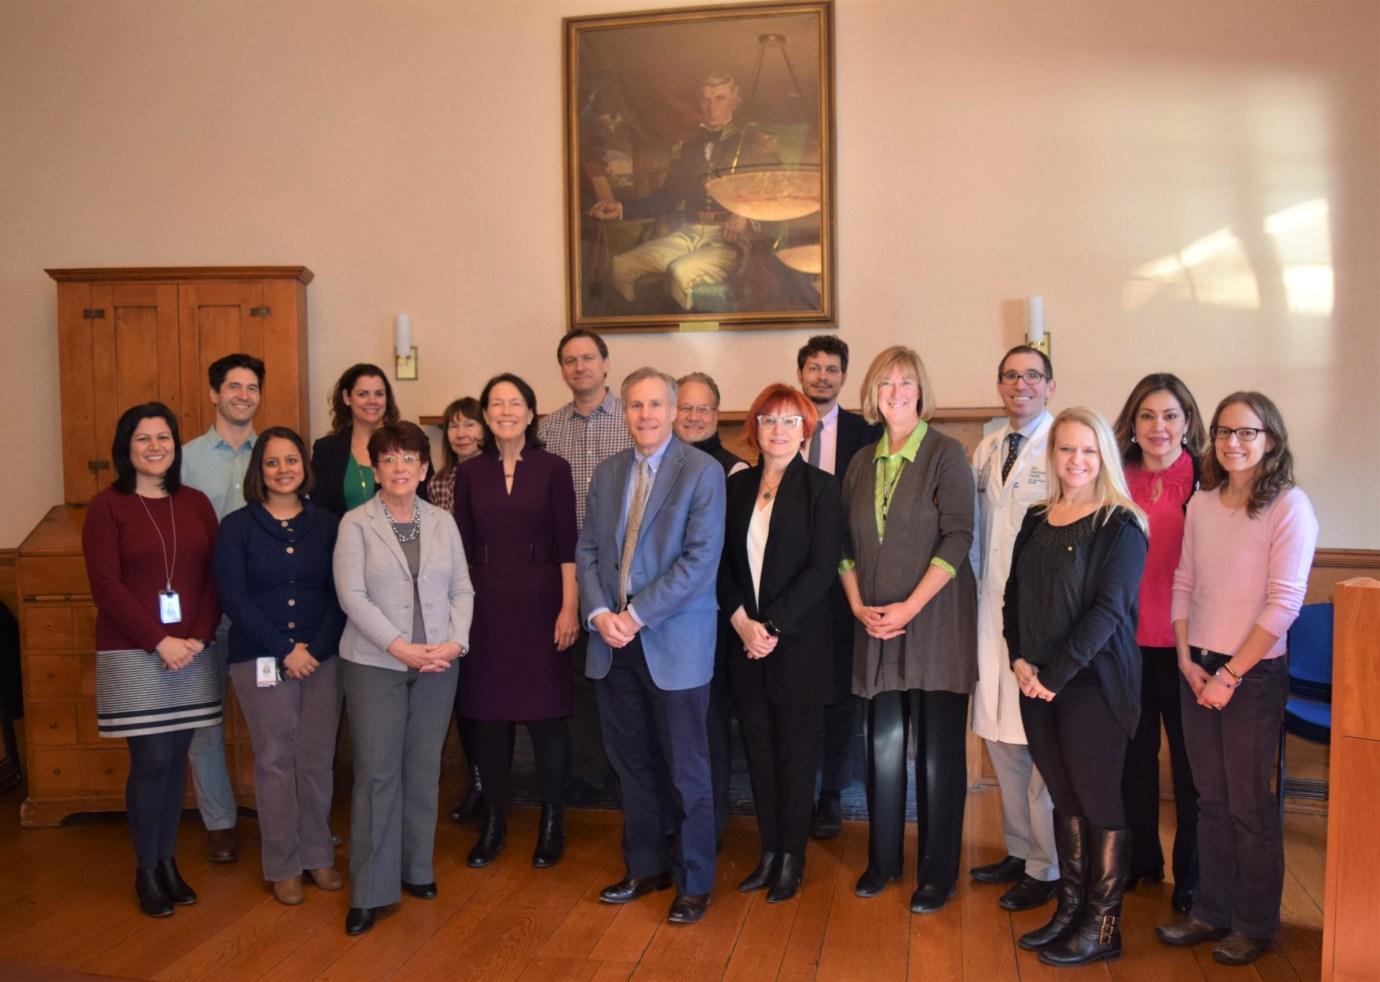 Gail D'Onofrio, MD, Linda M. Collins, PhD, and Steven Bernstein, MD